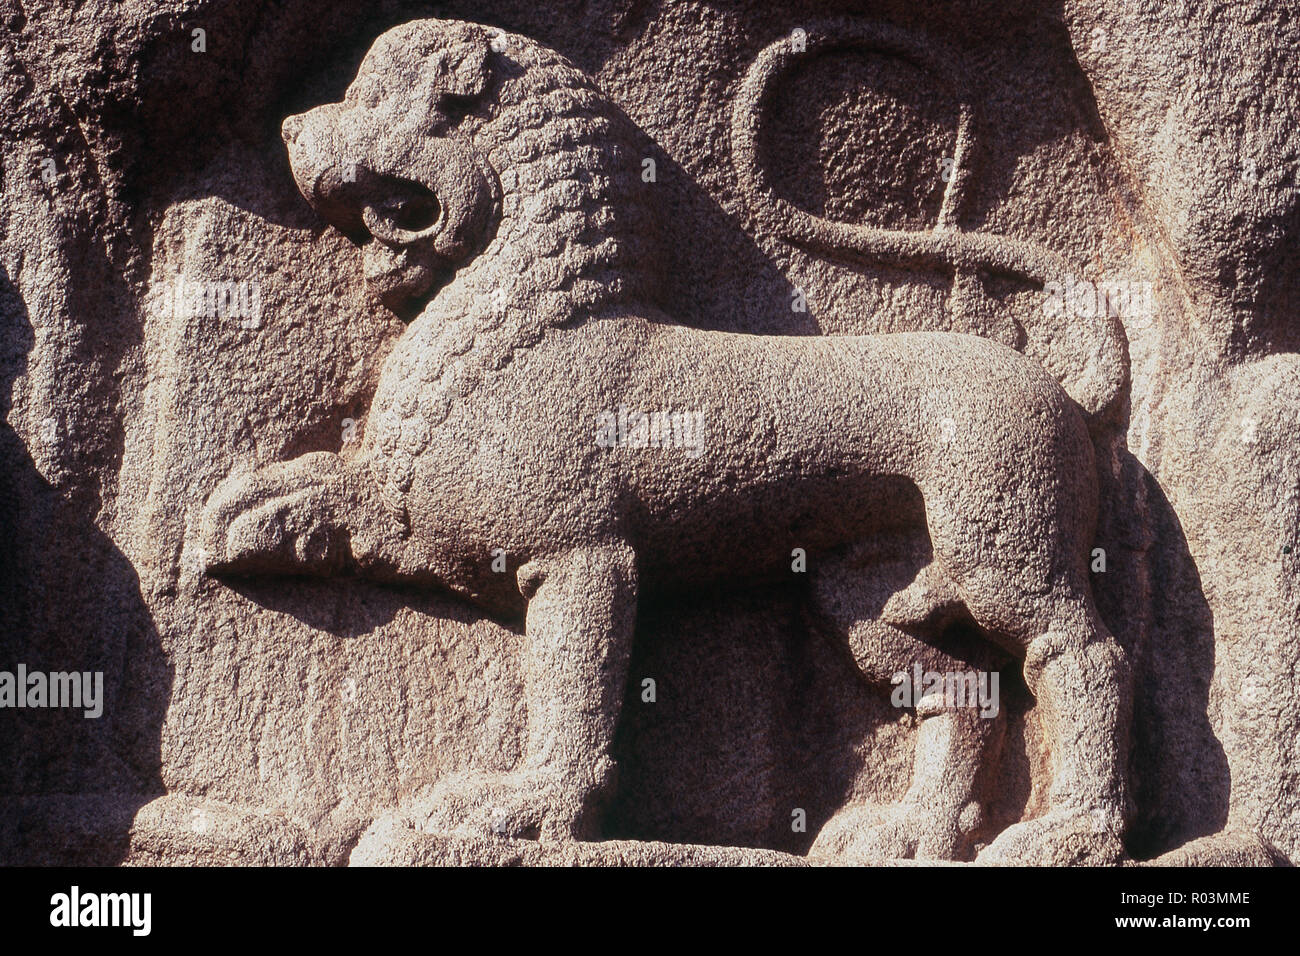 Mythological carved animal, Arjuna's Penance, Mamallapuram